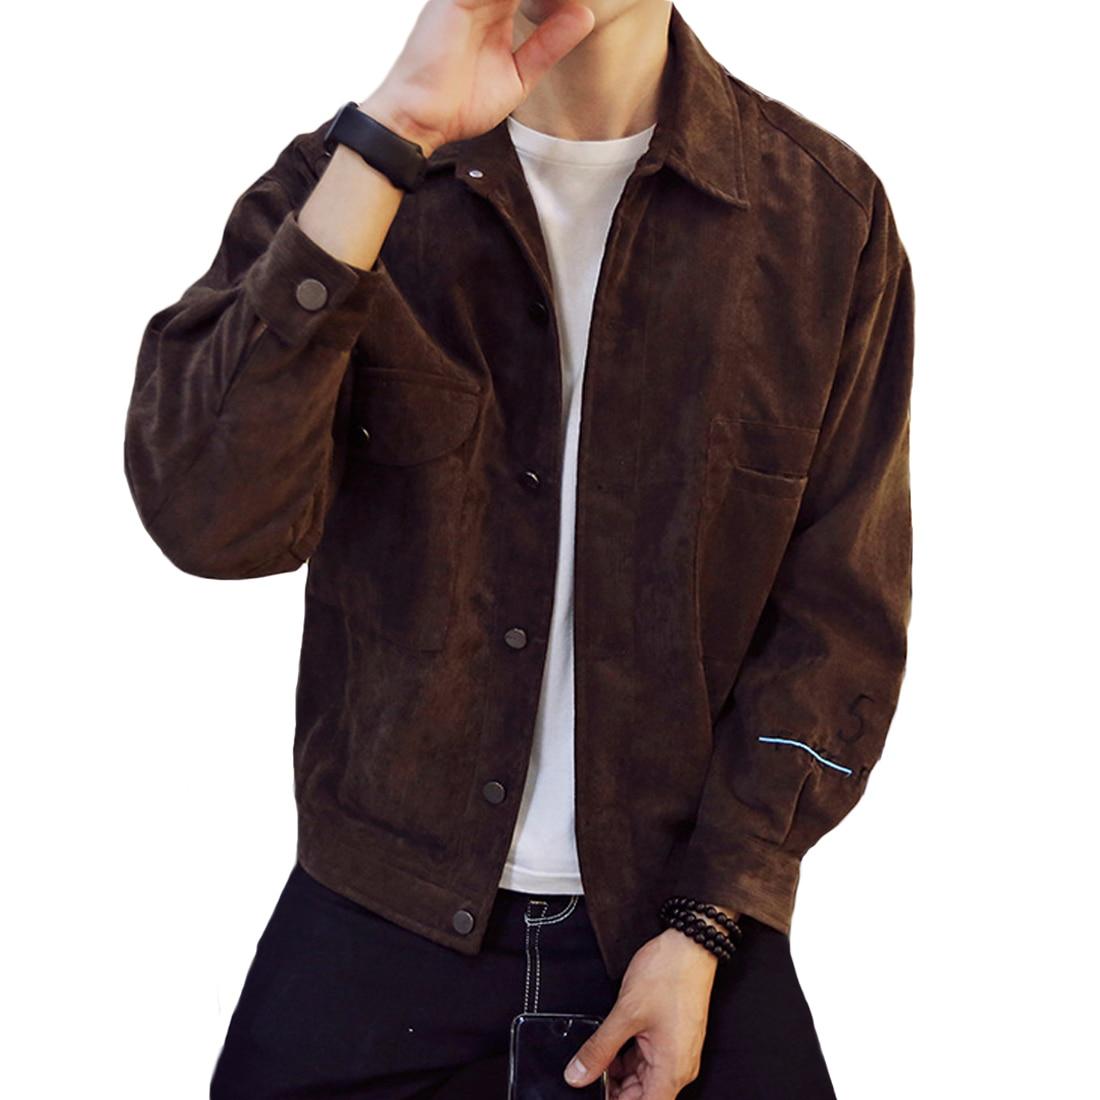 2017 bape Brand Clothing jacket Gray Pocket Coat Casual Jacket ...